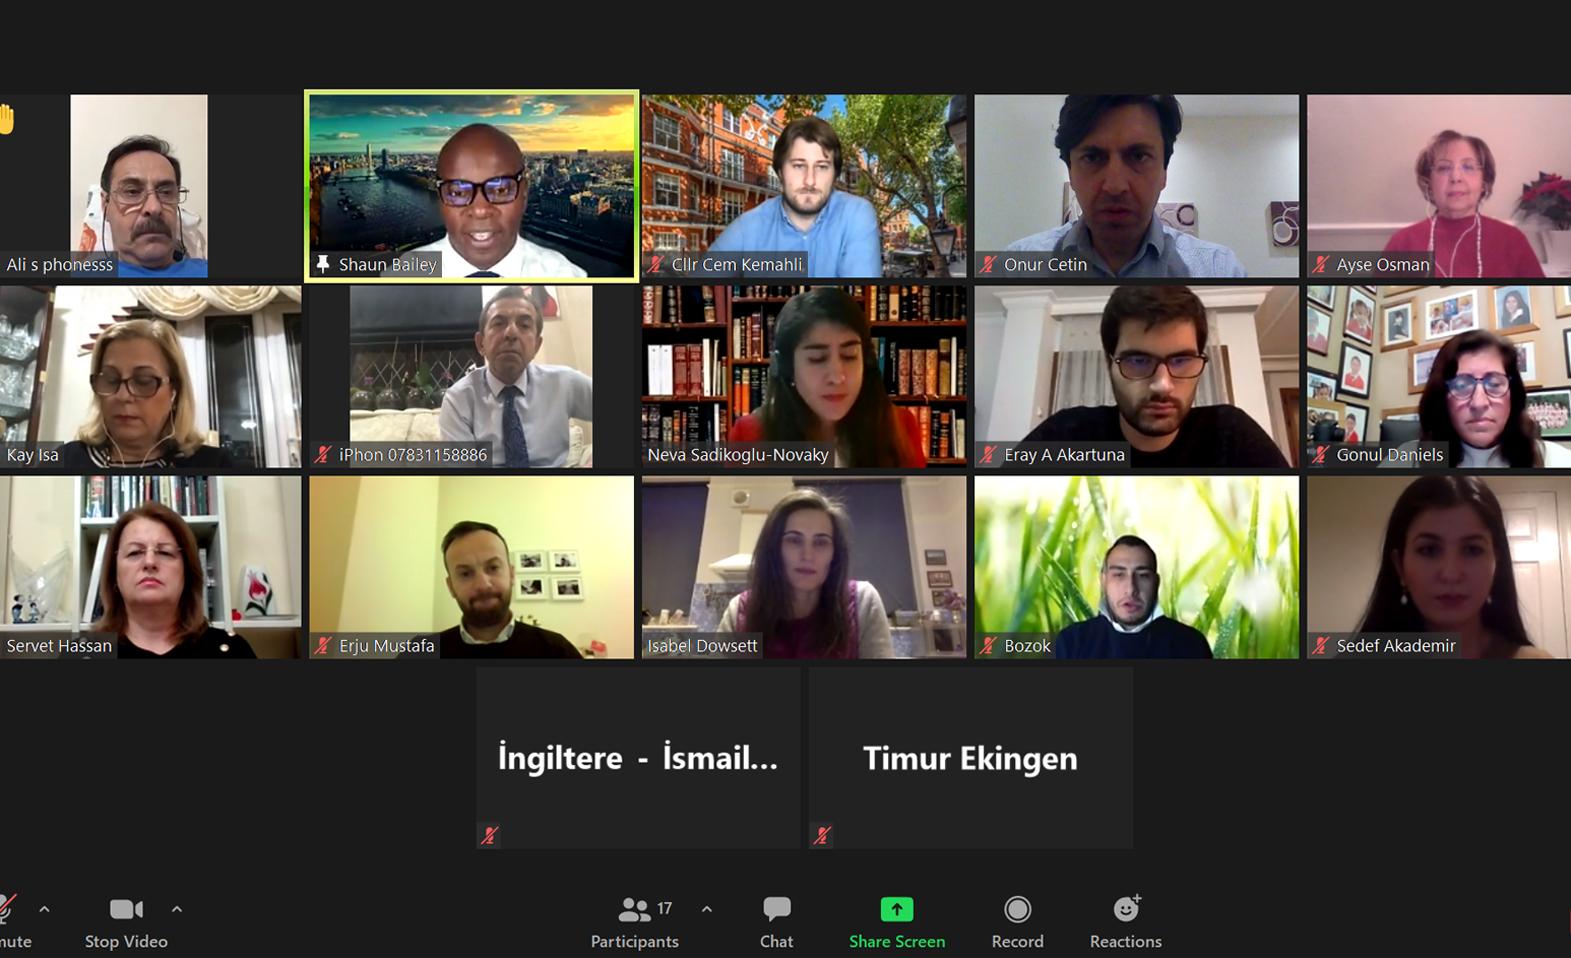 Shaun Bailey meets Turkish community in virtual roundtable